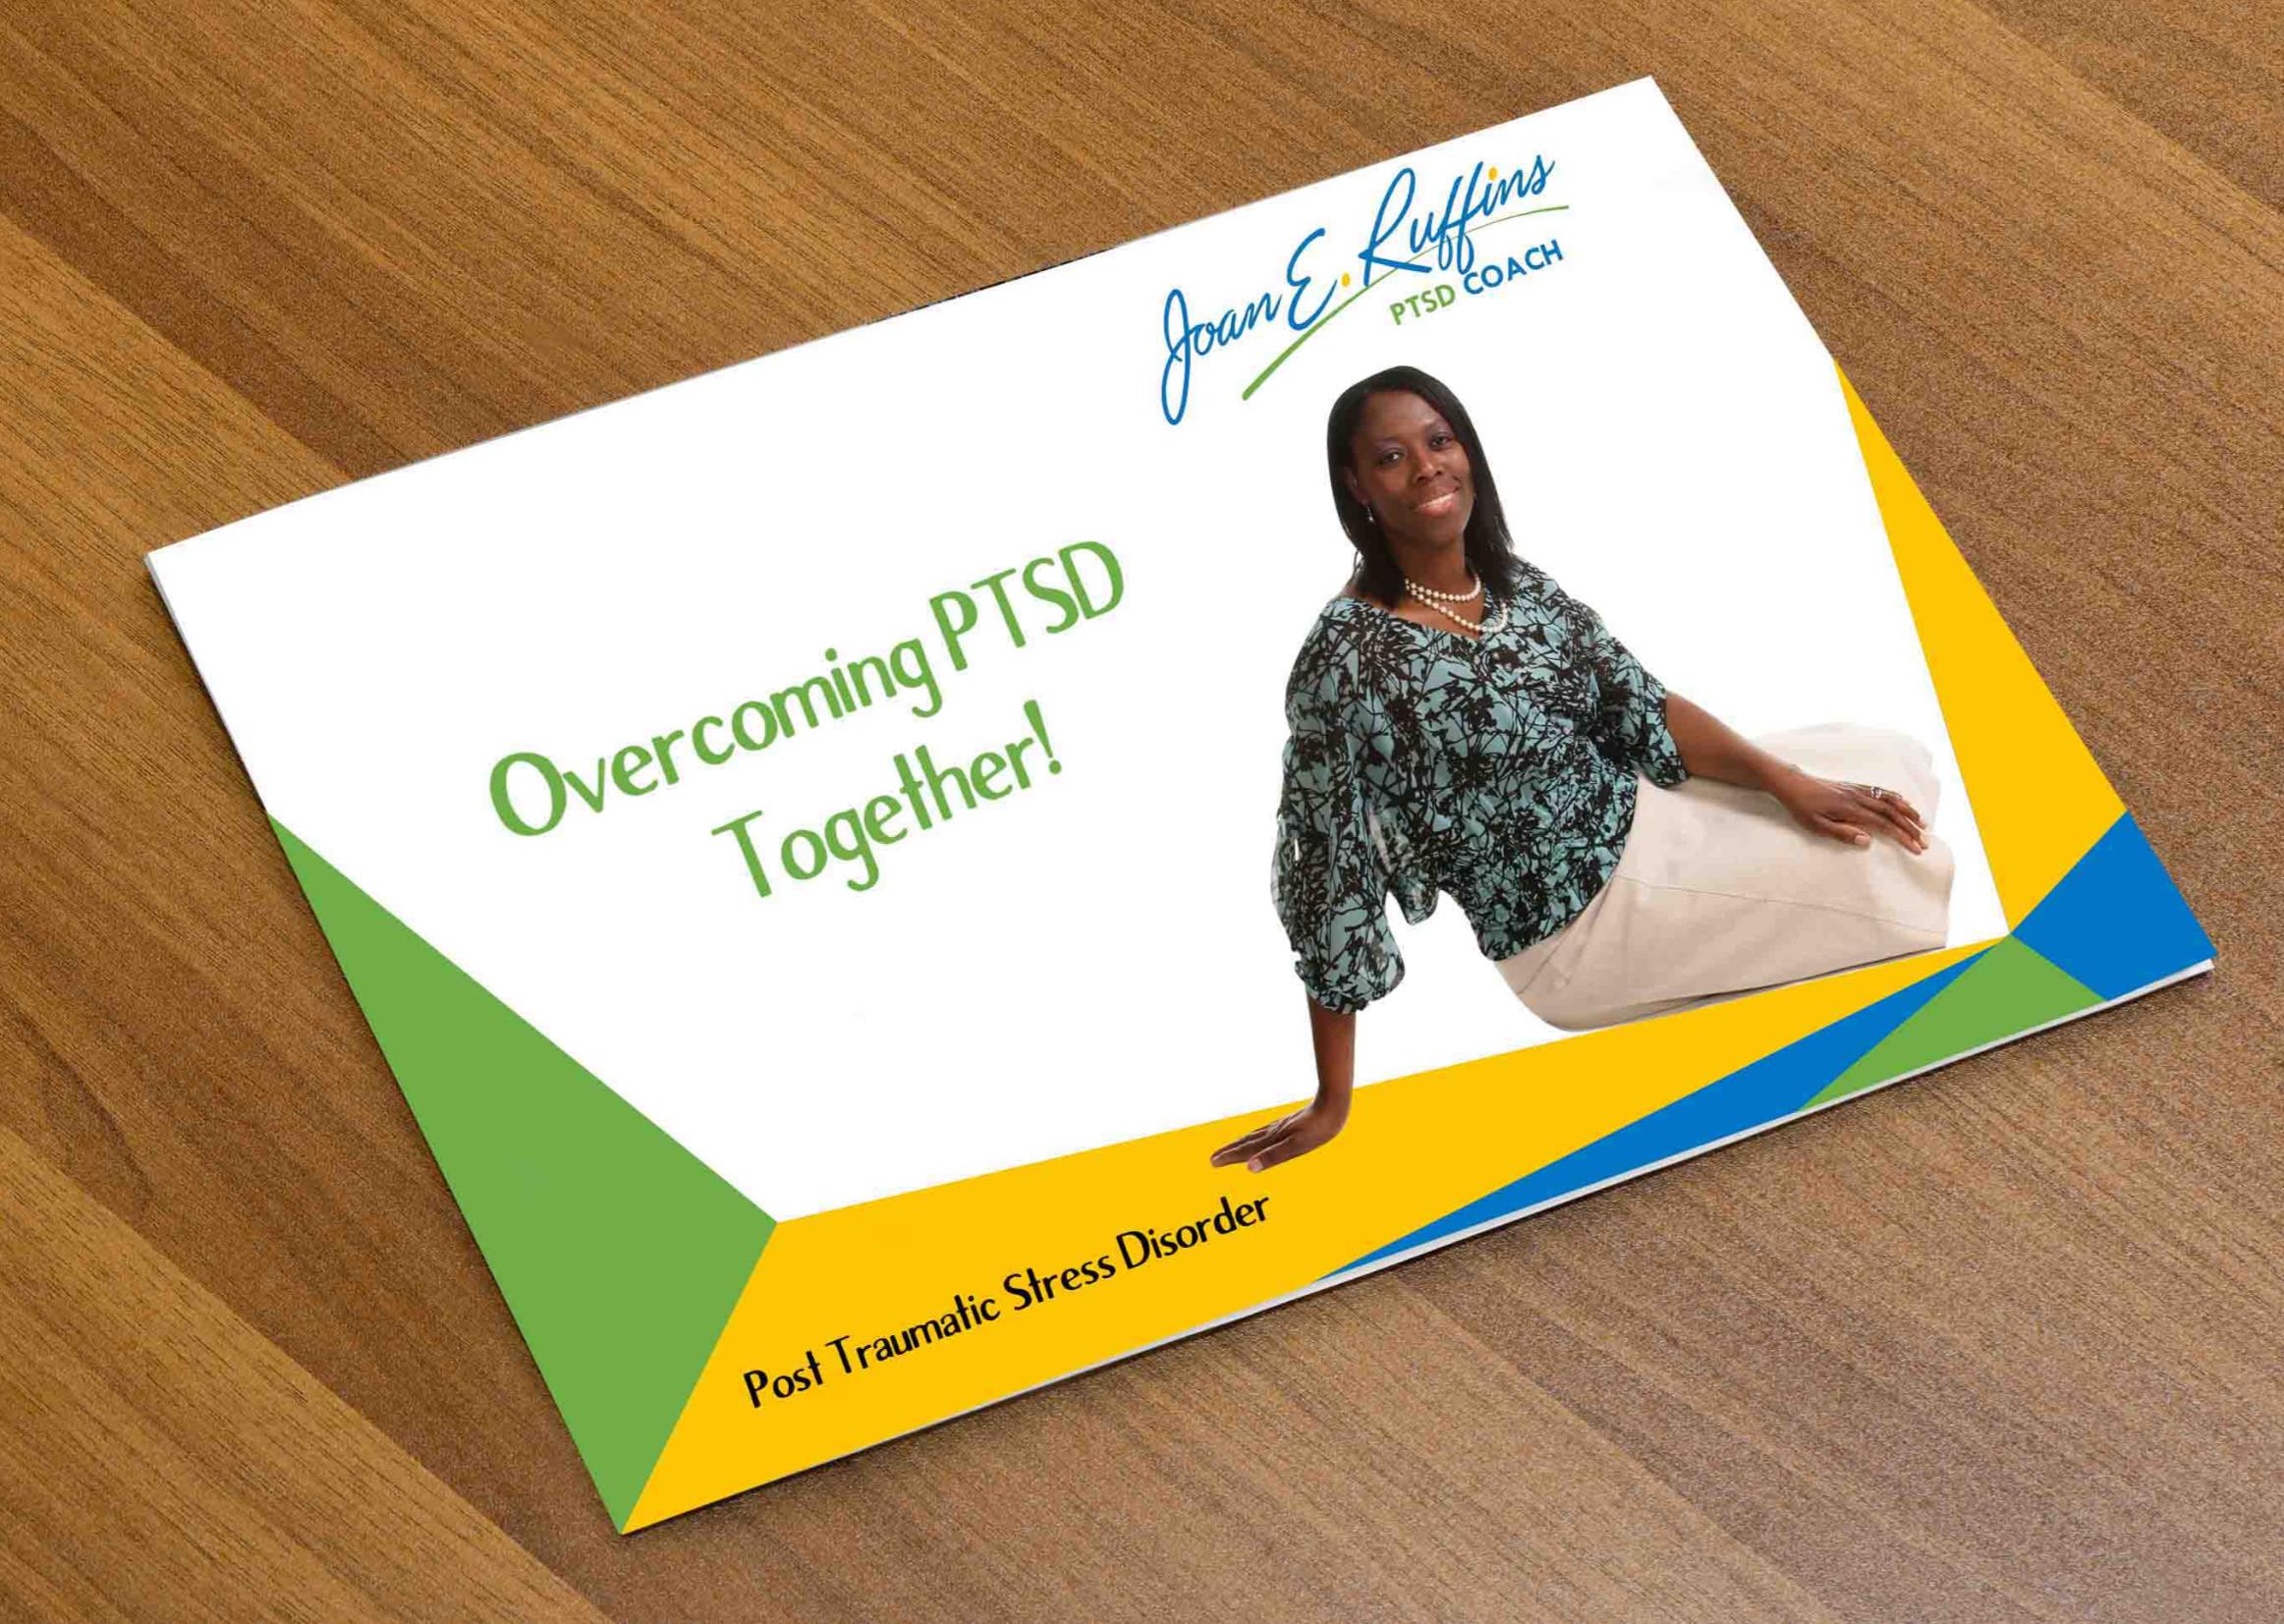 Overcoming PTSD Course